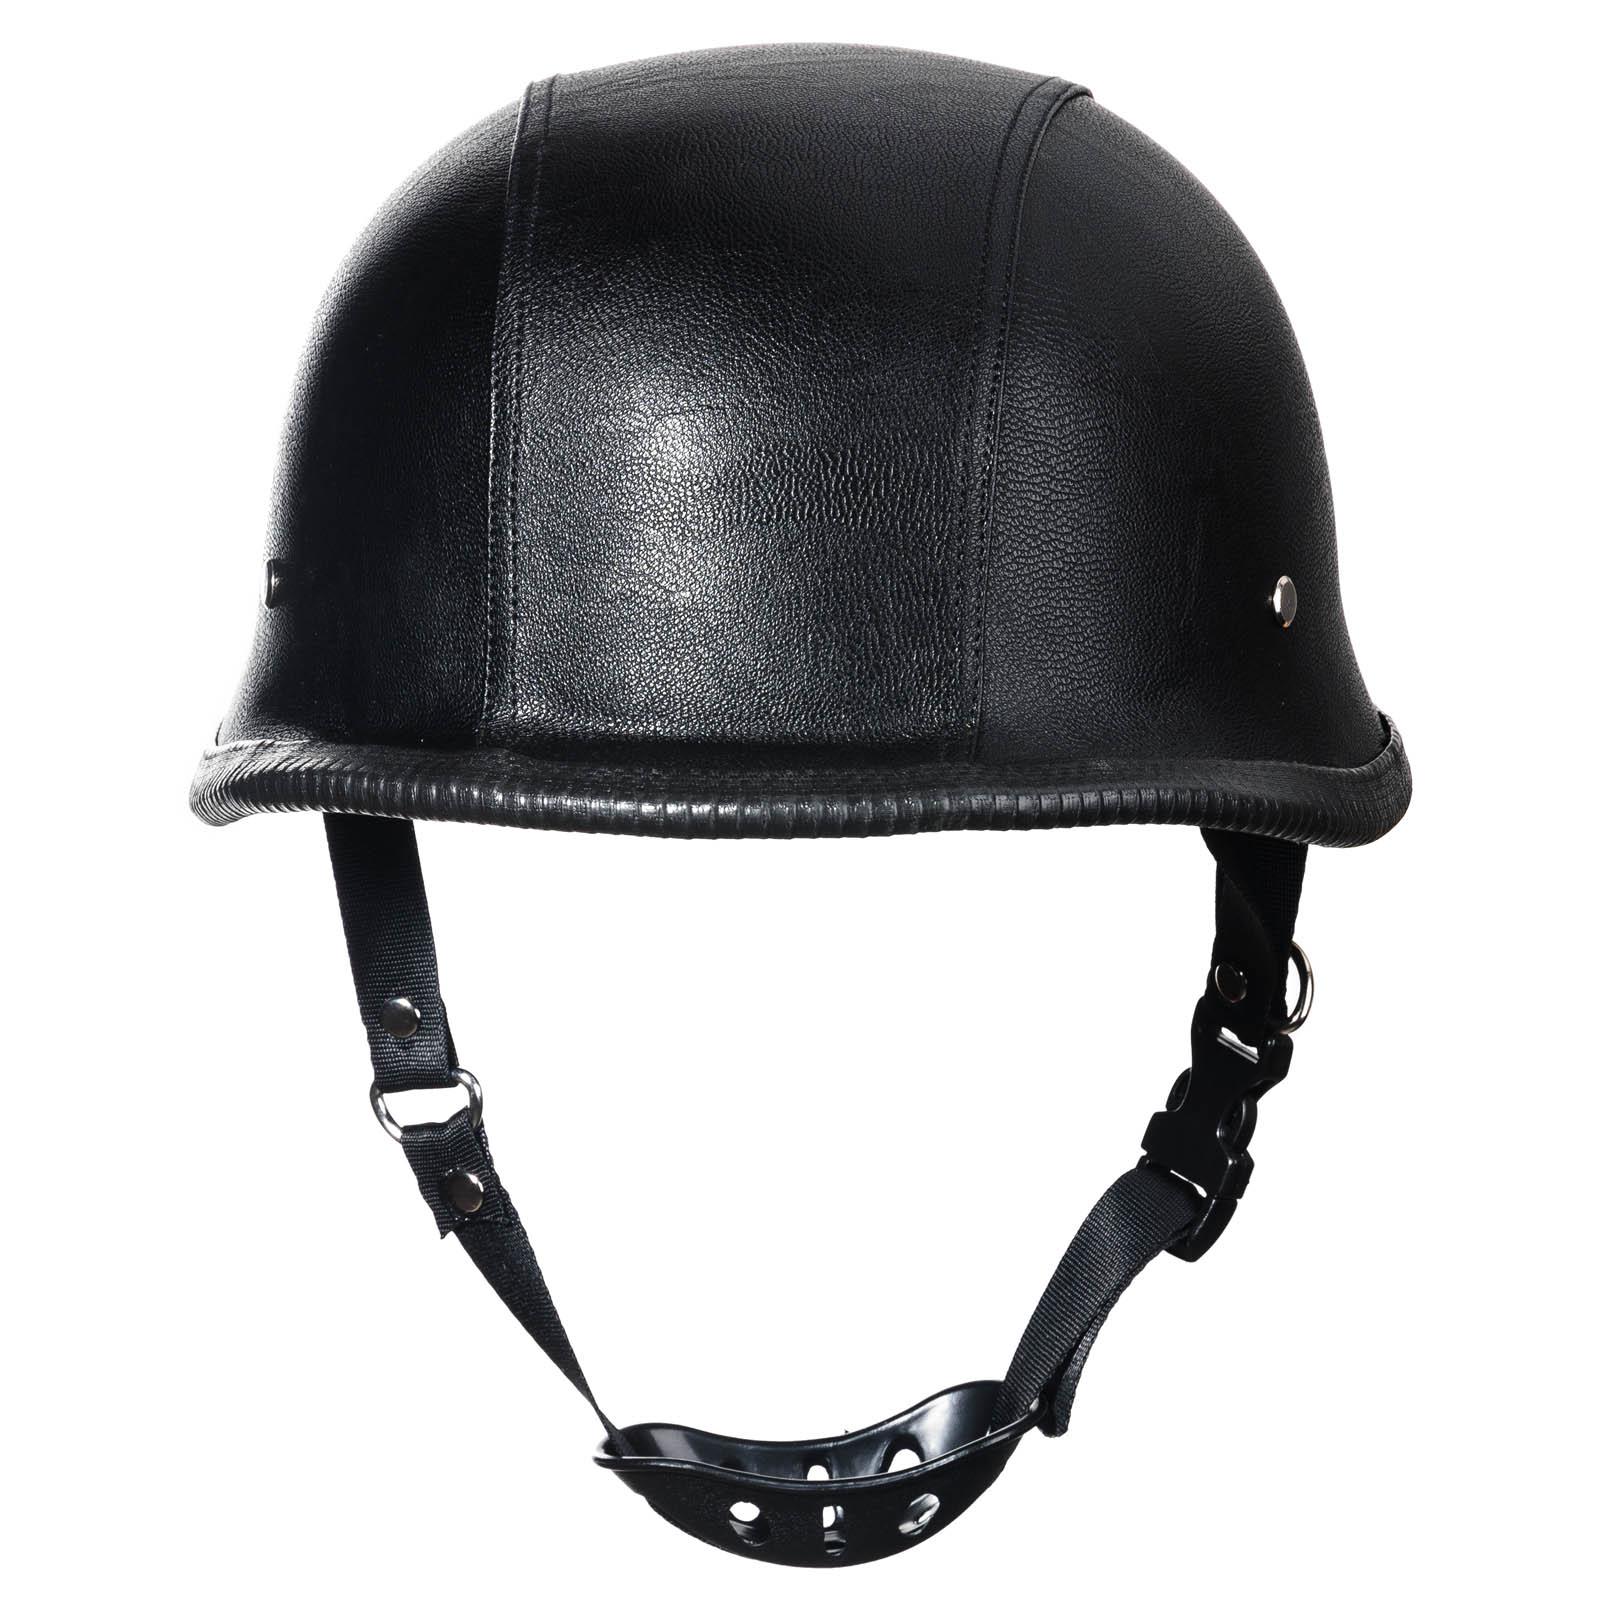 2016 new wwii german style dot motorcycle helmet black. Black Bedroom Furniture Sets. Home Design Ideas